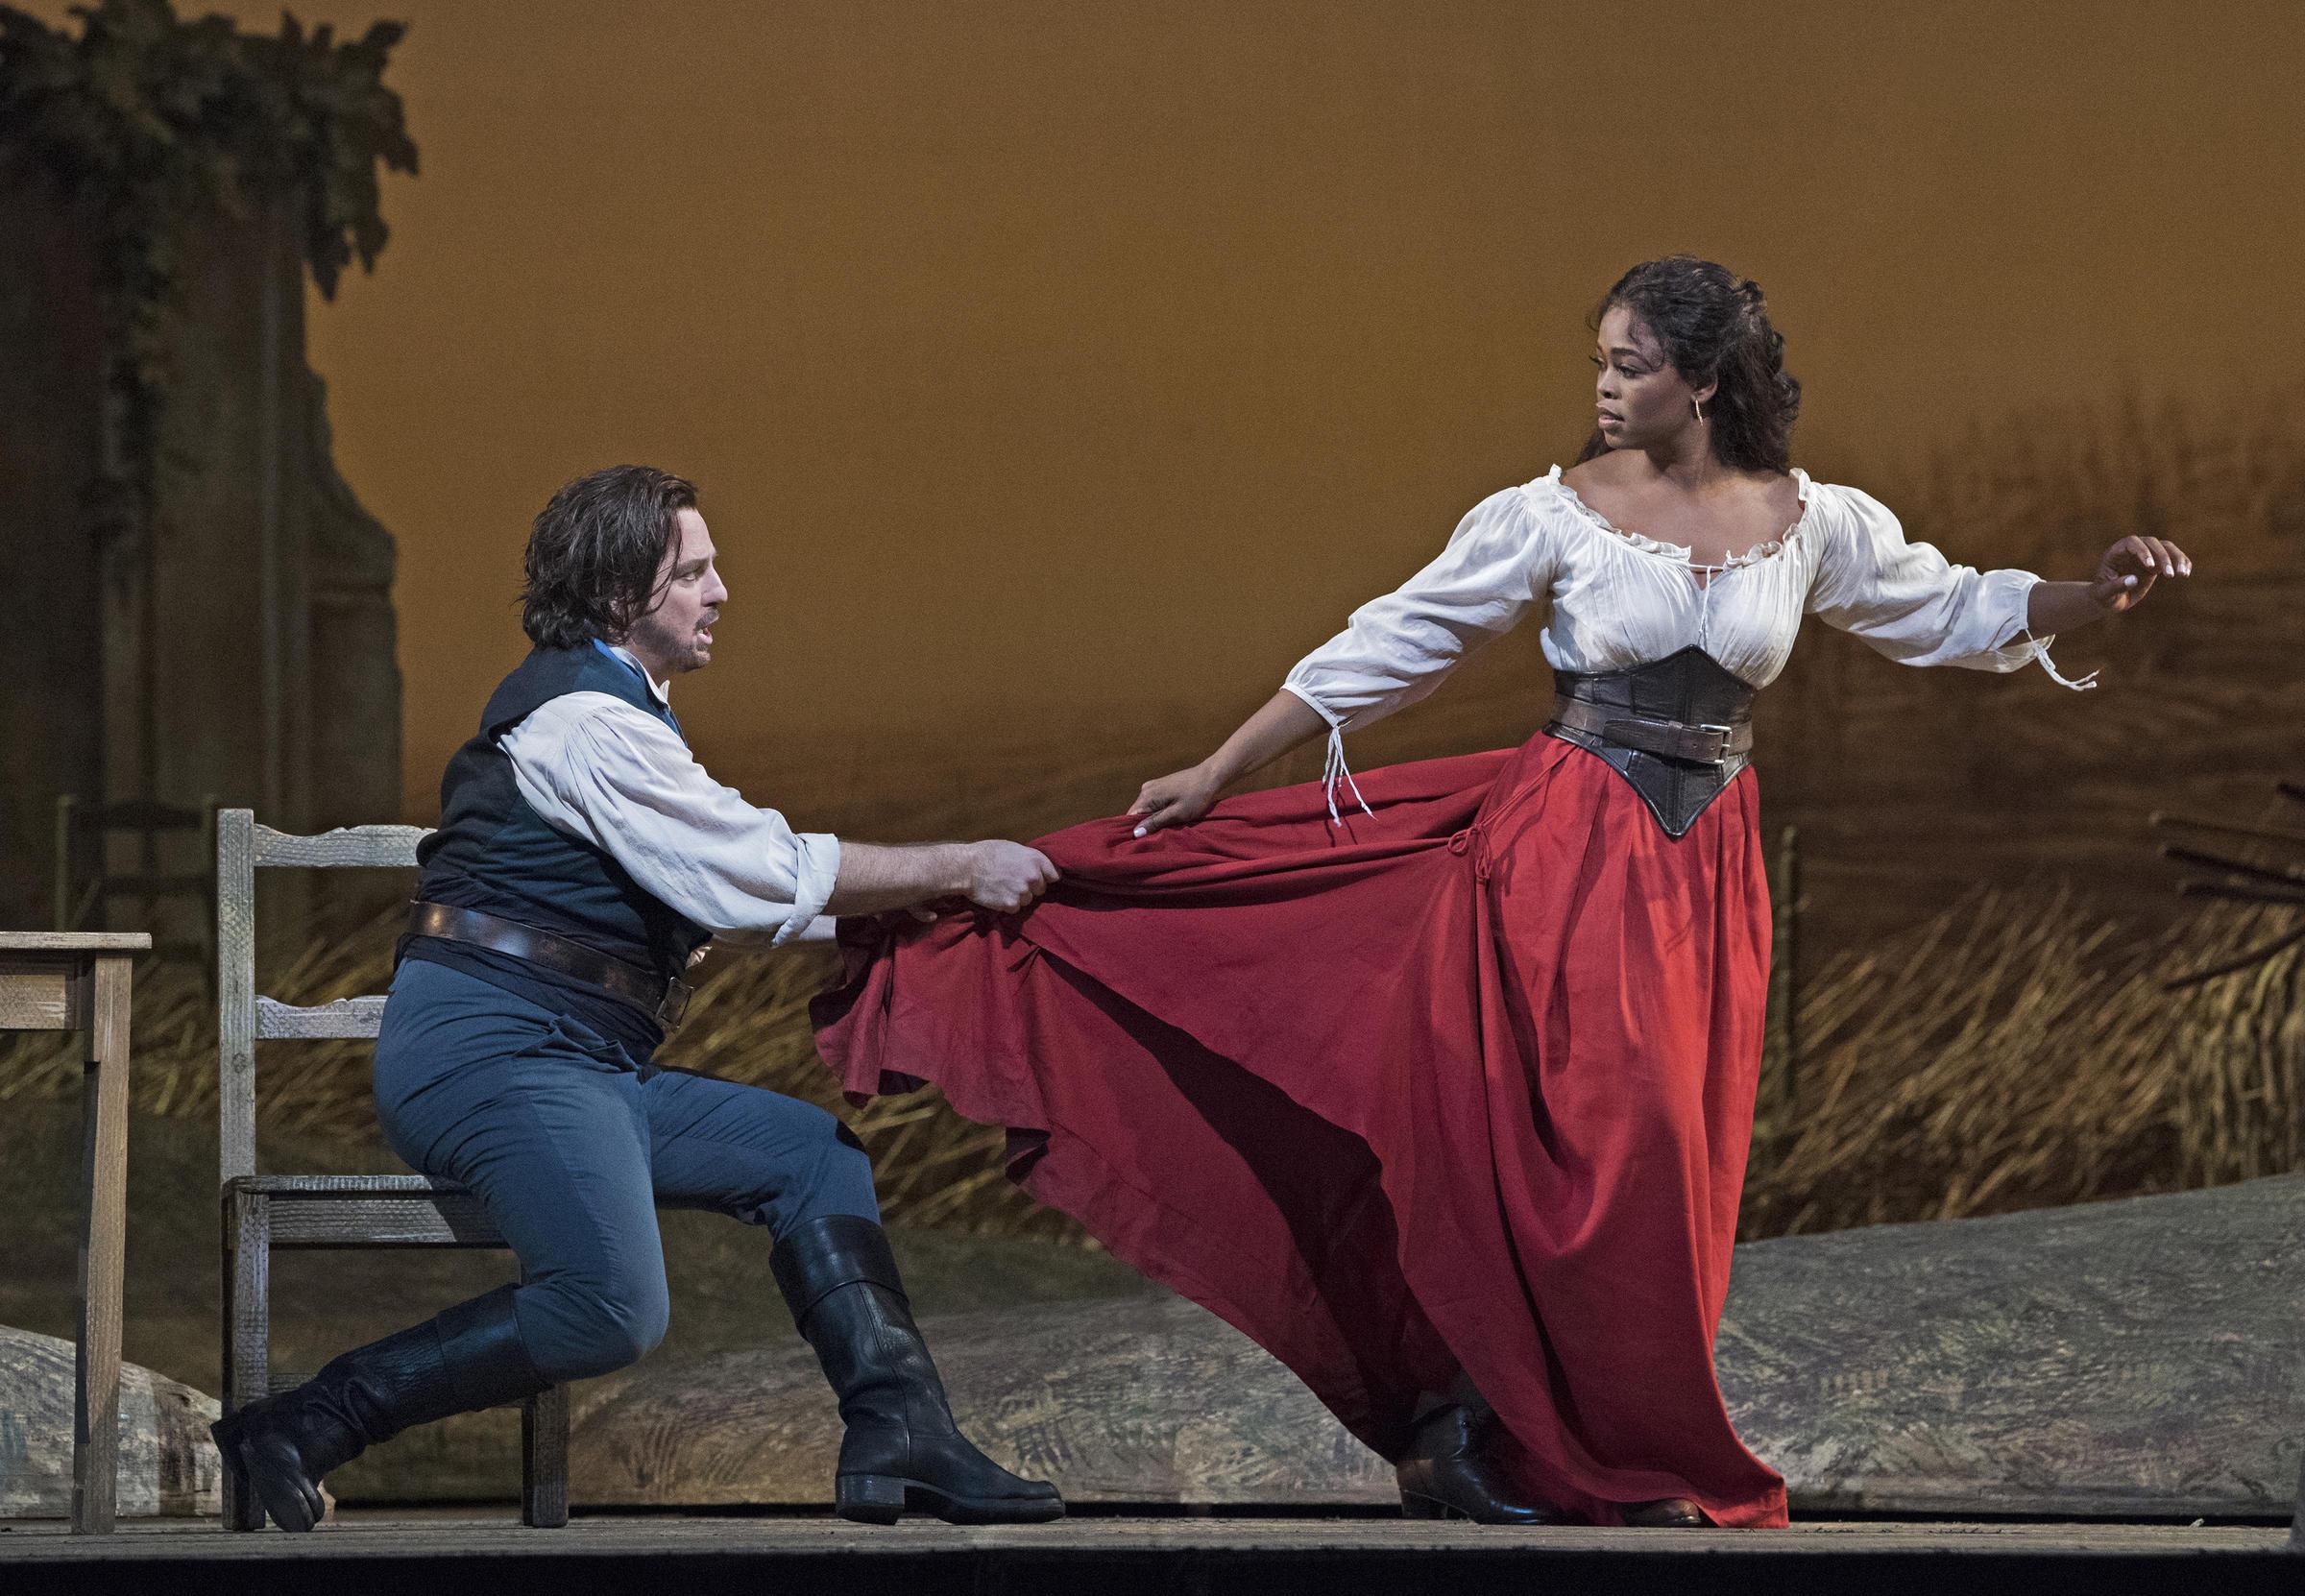 Metropolitan Opera: L'Elisir d'Amore | Interlochen